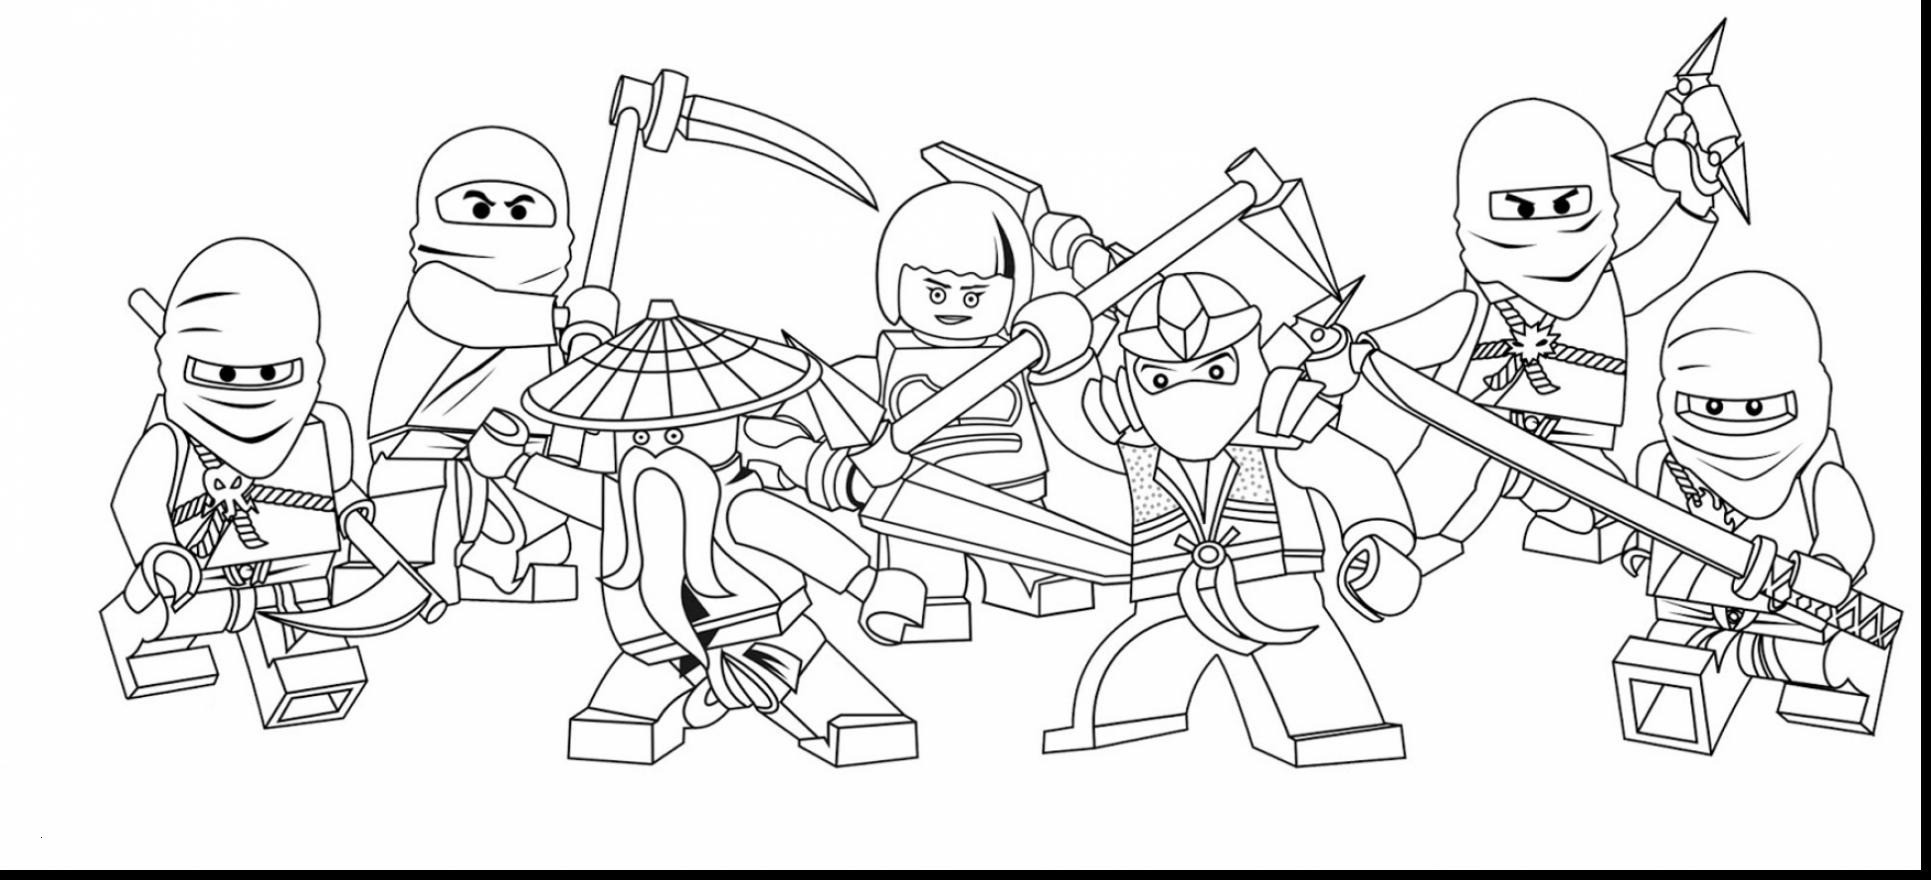 Lego Ninjago Malvorlagen Das Beste Von Lego Ausmalbilder Ninjago Uploadertalk Elegant Lego Ninjago Das Bild